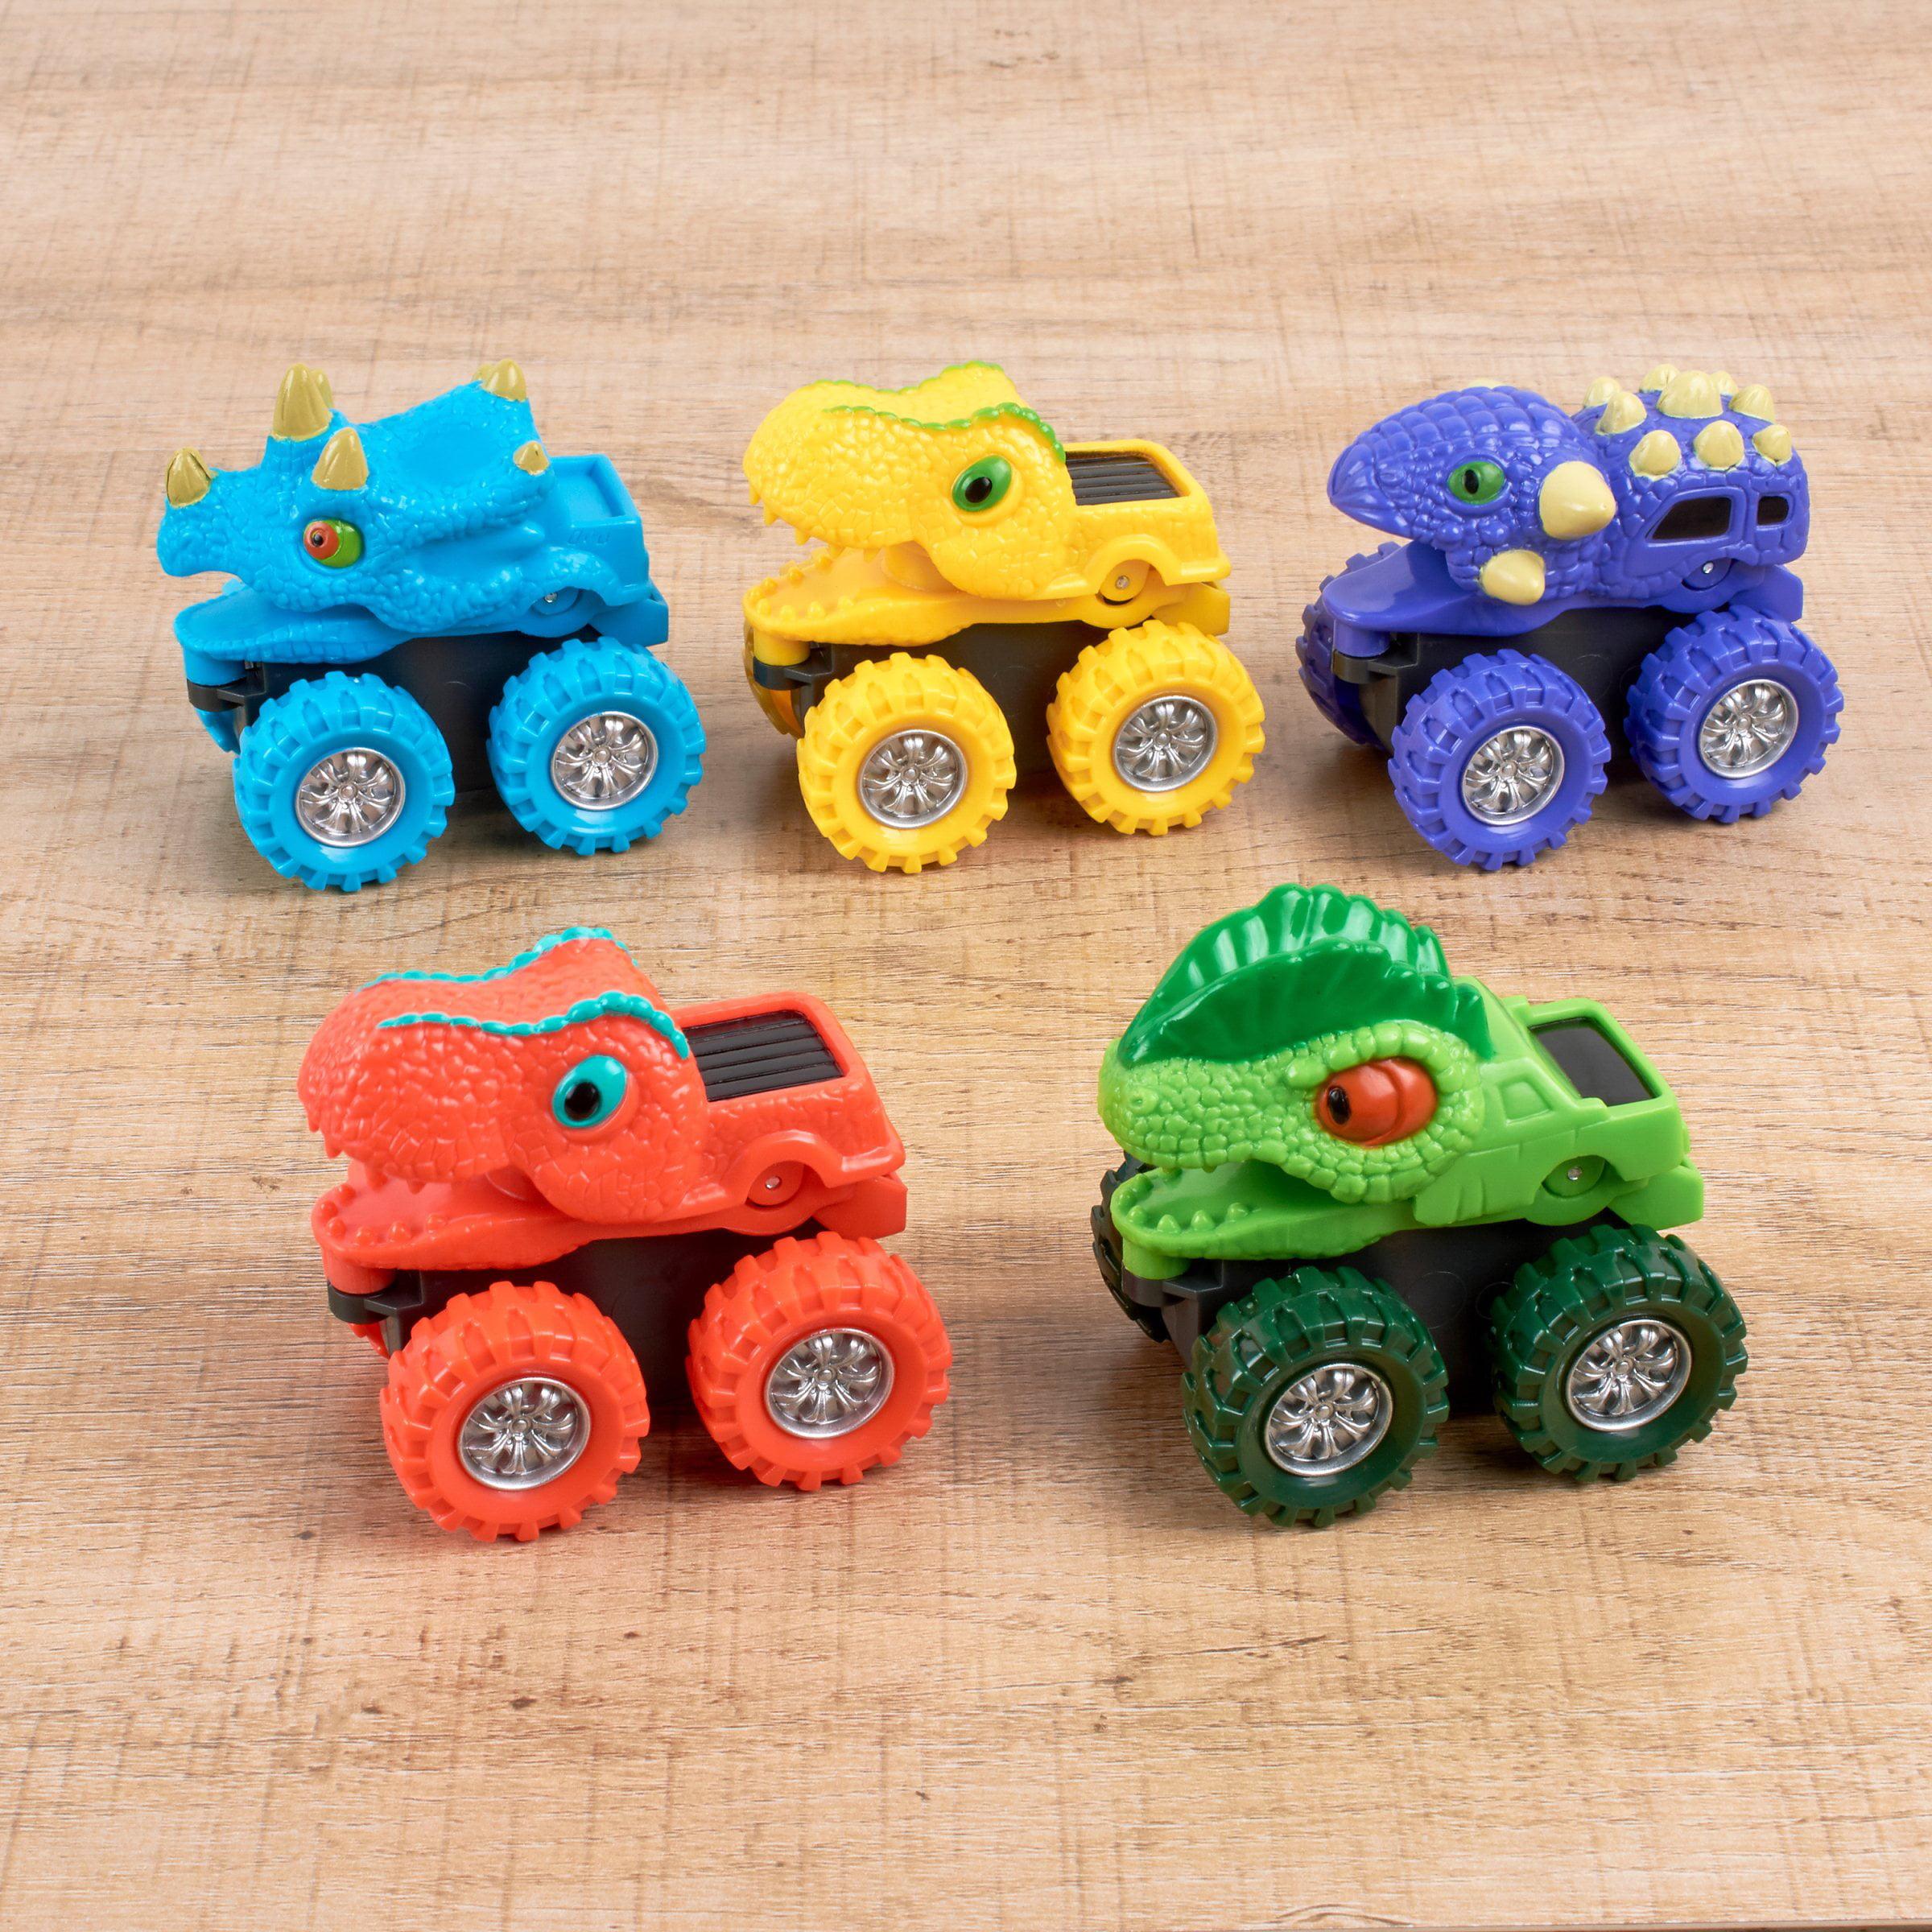 Spark Create Imagine 5 Piece Dino Monster Truck Play Set Walmart Com Walmart Com